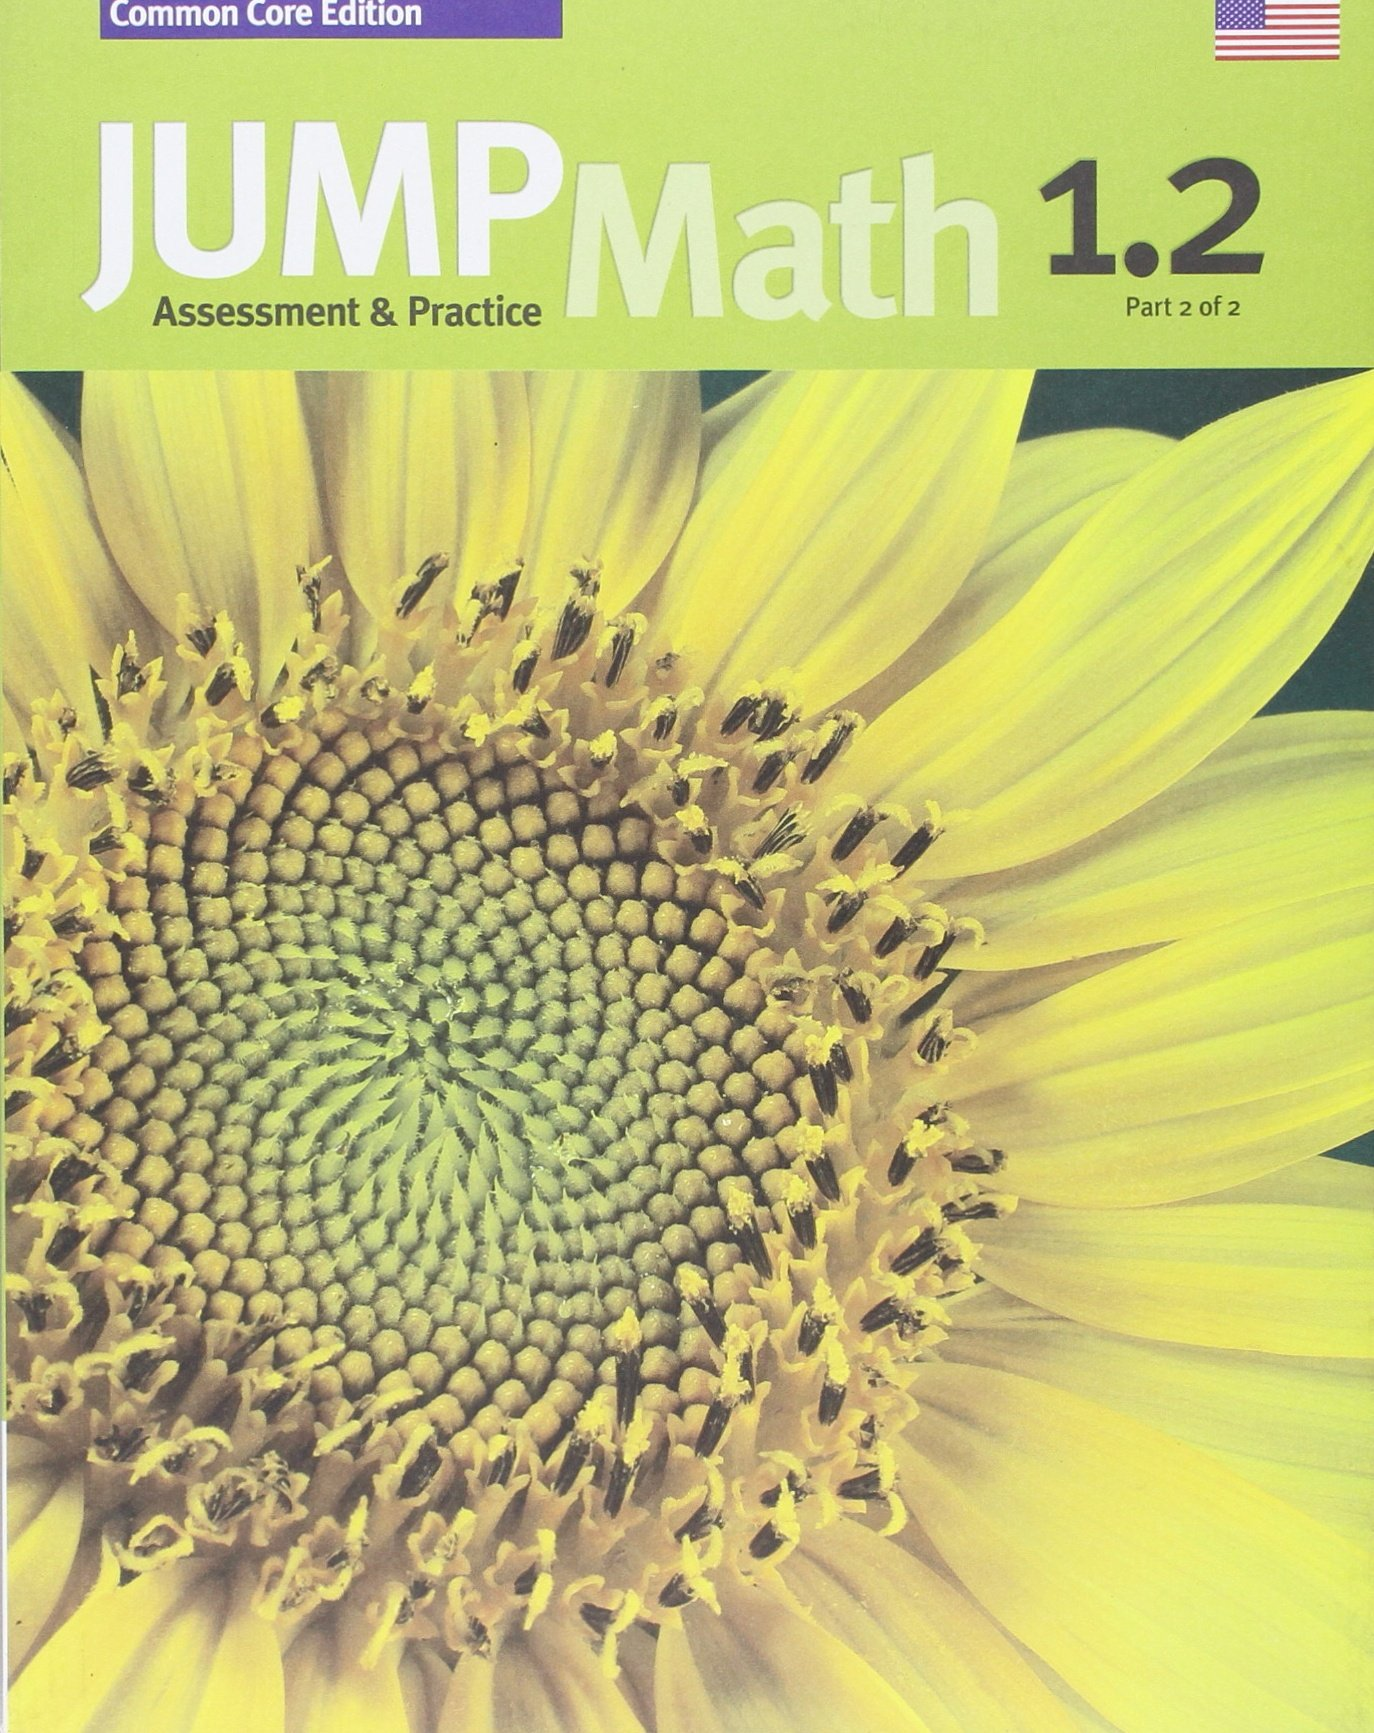 Download JUMP Math AP Book 1.2: US Common Core Edition pdf